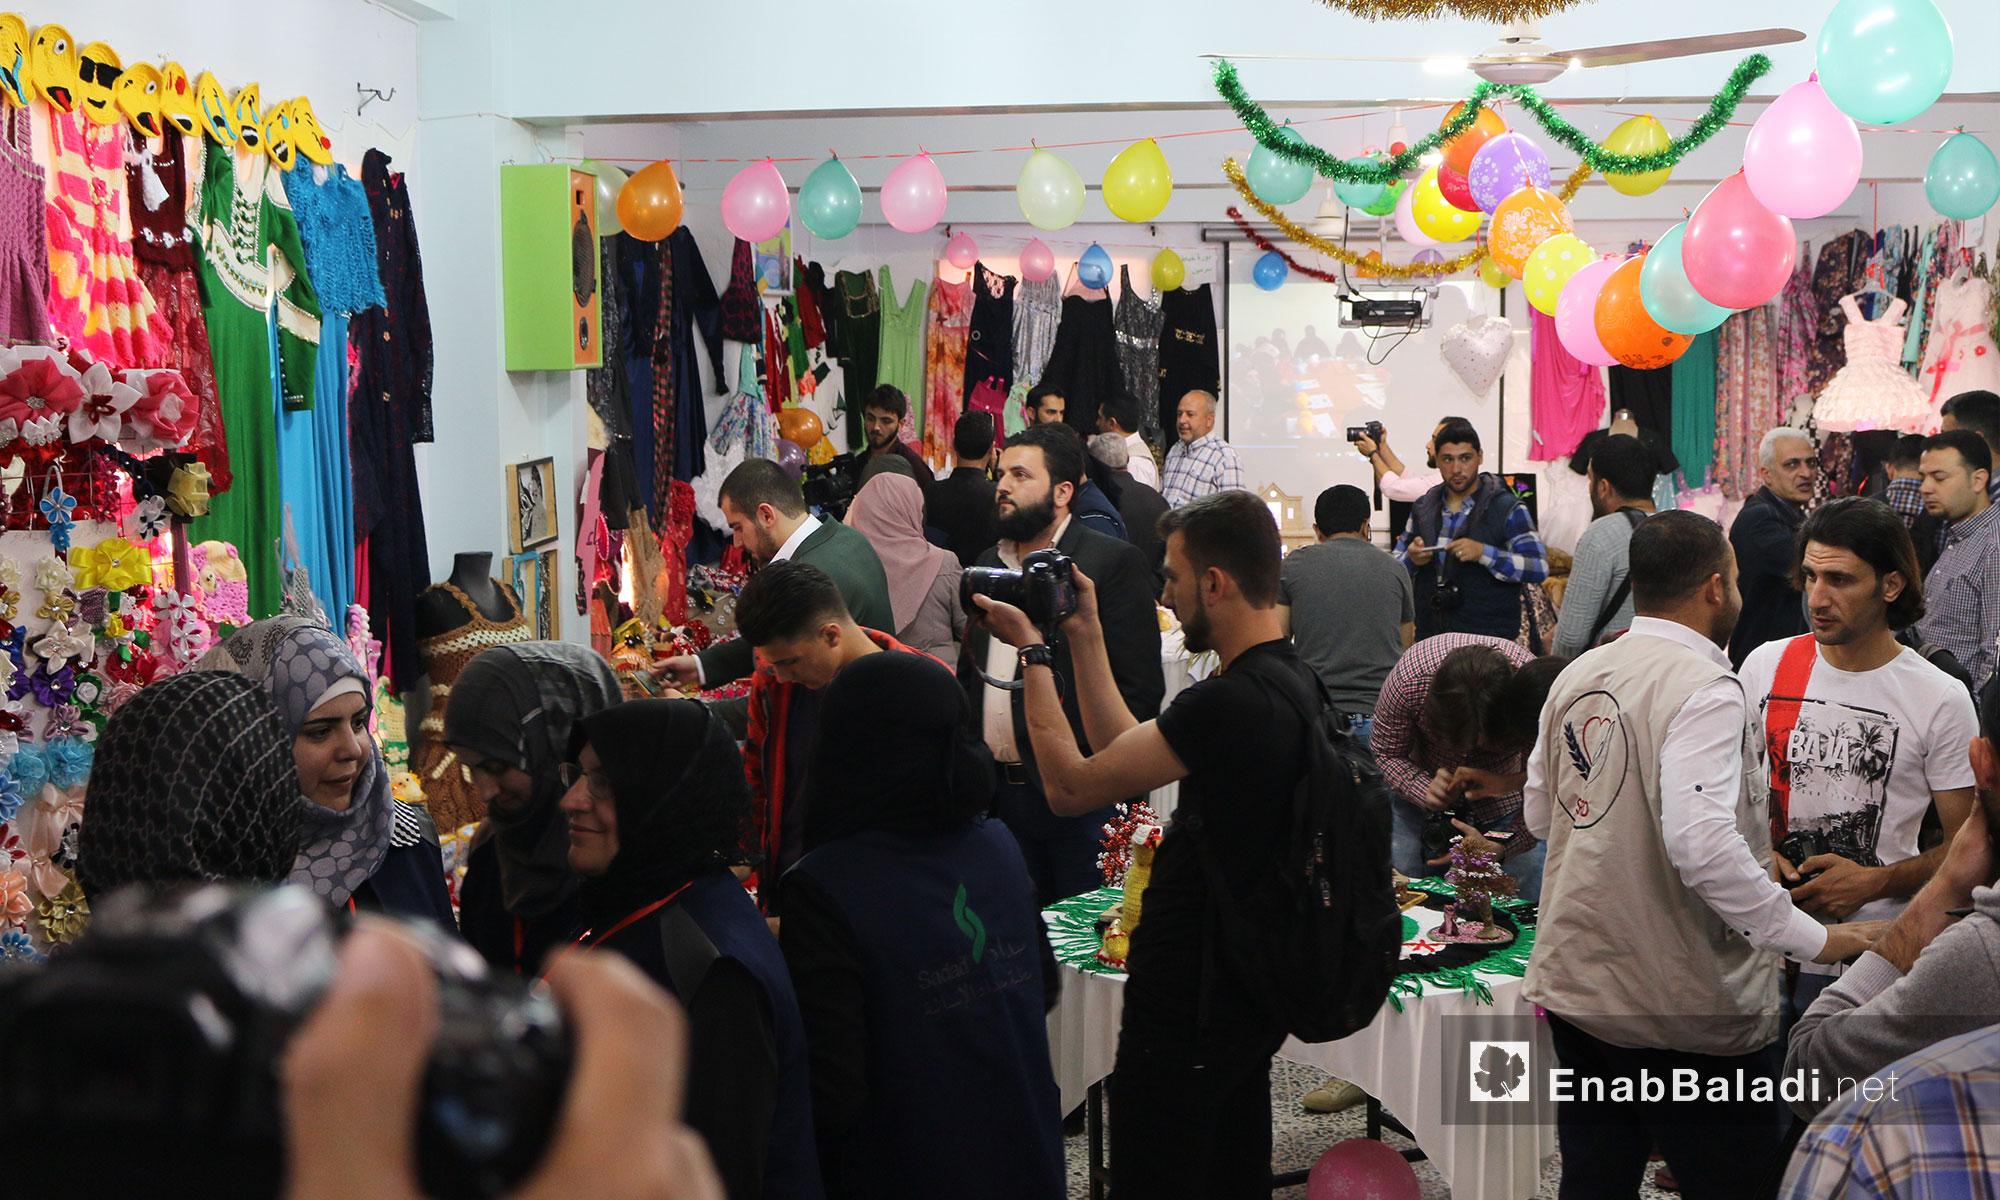 Handicrafts exhibition in the city of Idlib – April 30. 2018 (Enab Baladi)